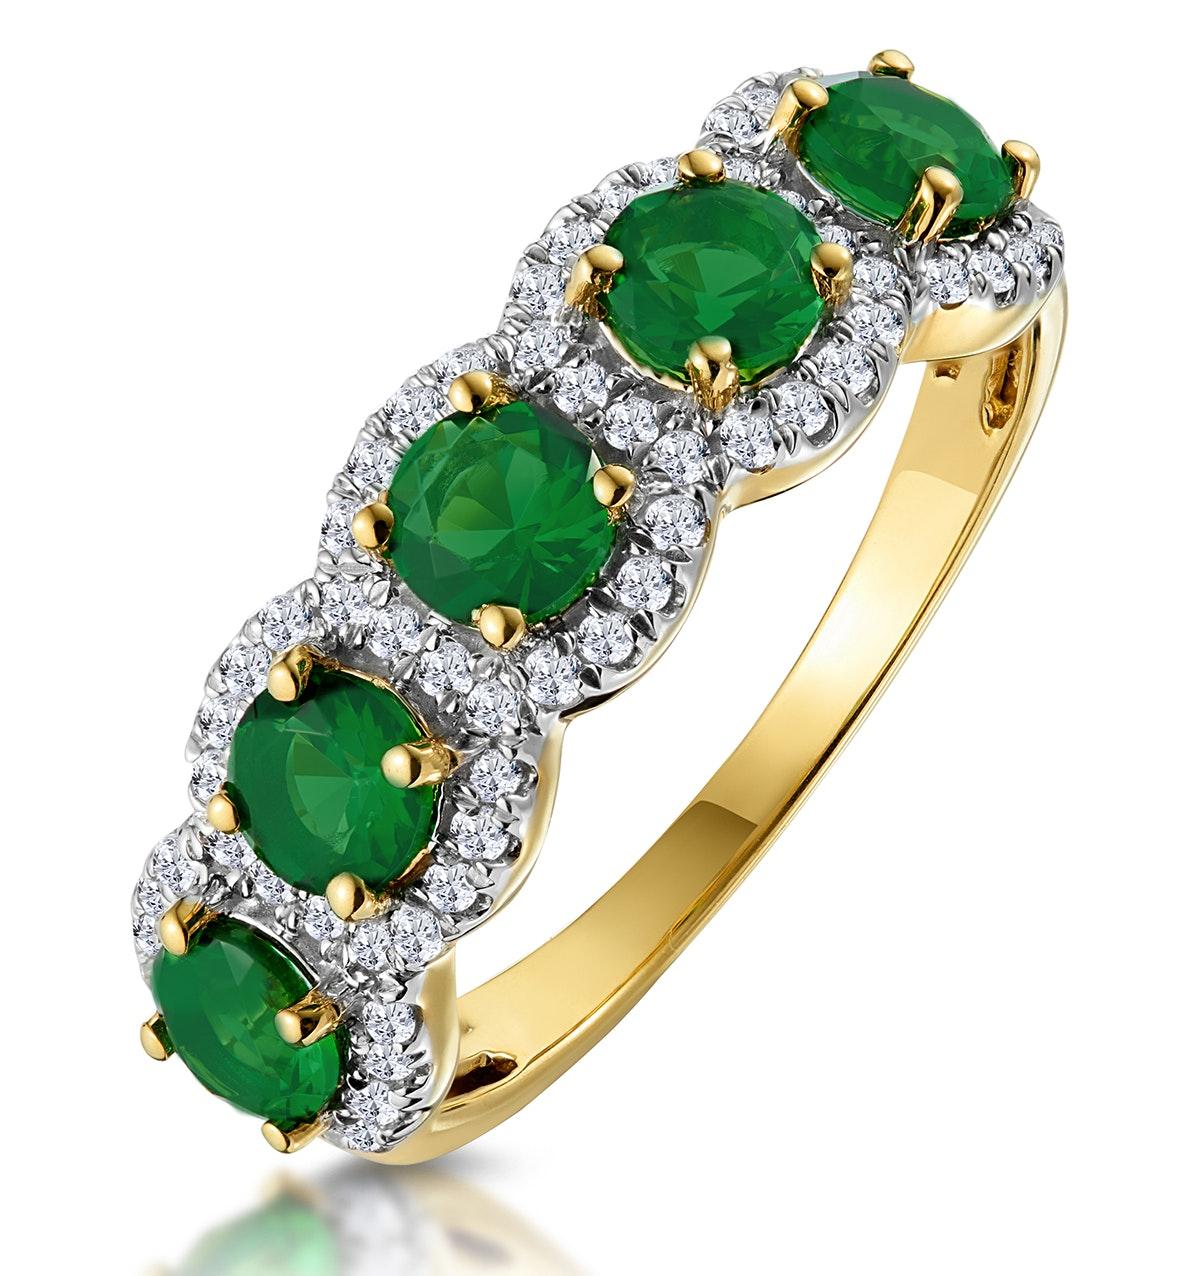 Emerald and Diamond Halo 5 Stone Asteria Ring in 18K Gold